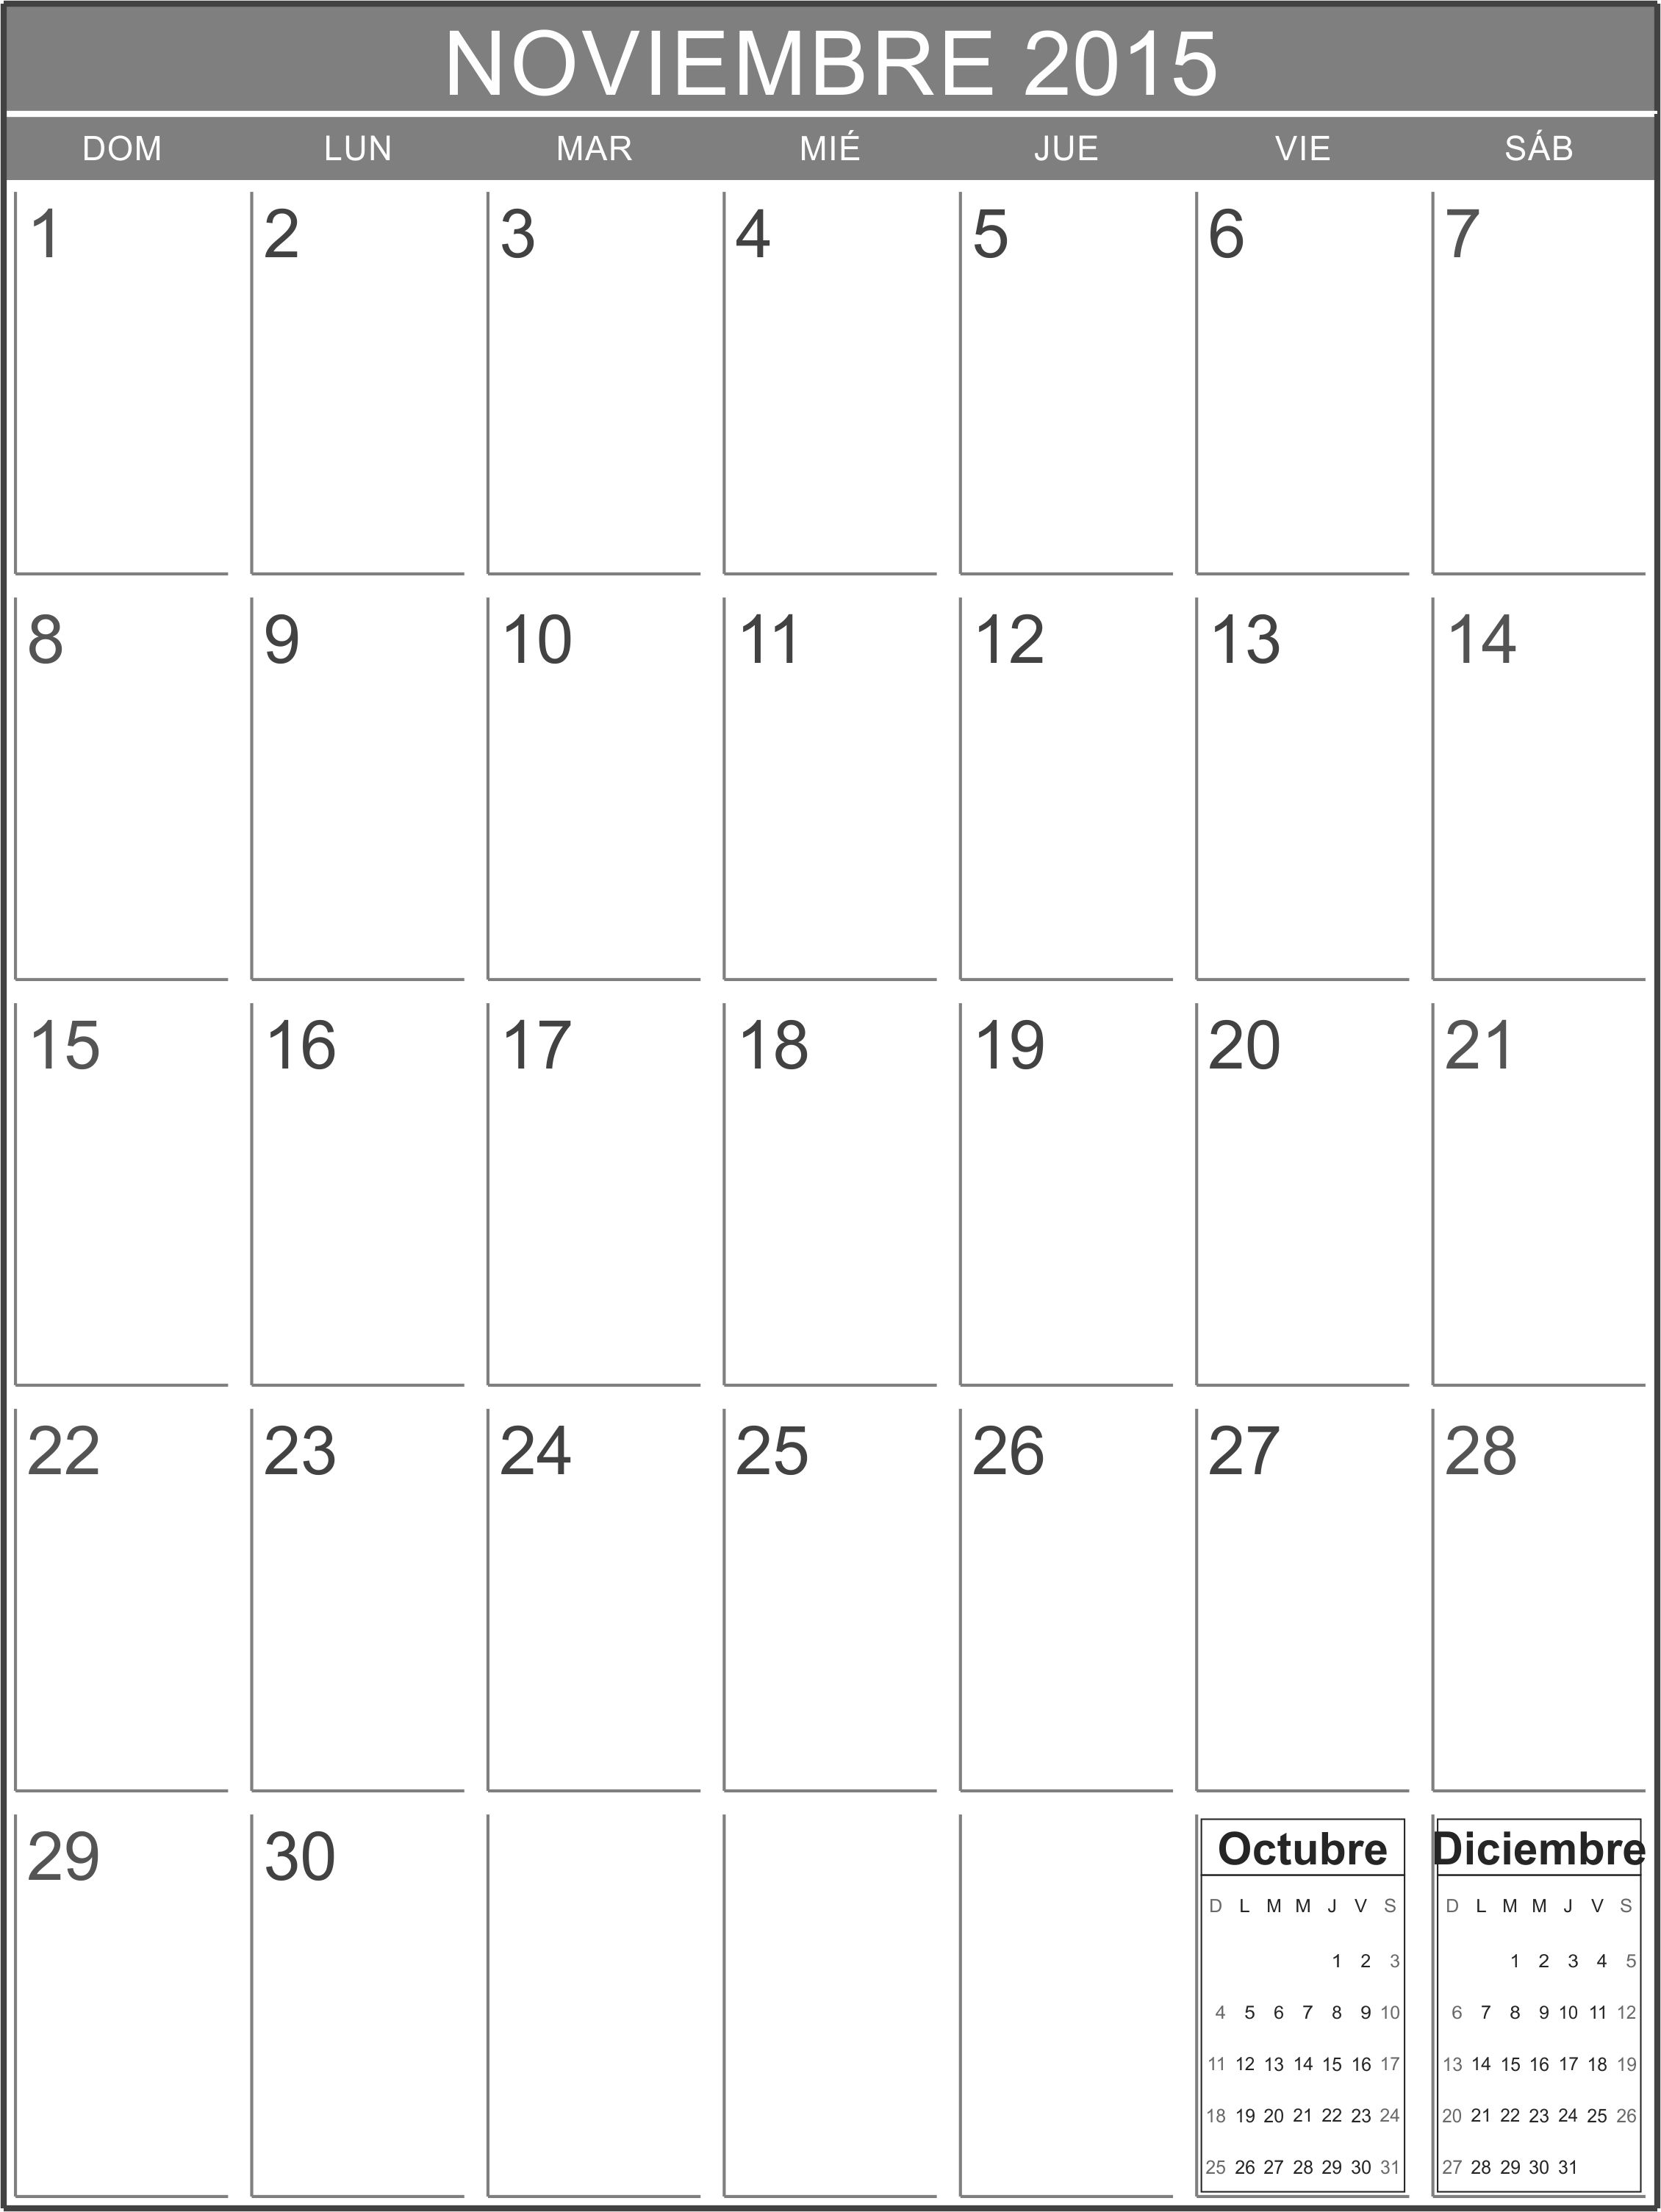 Calendario Nov 2015 para imprimir